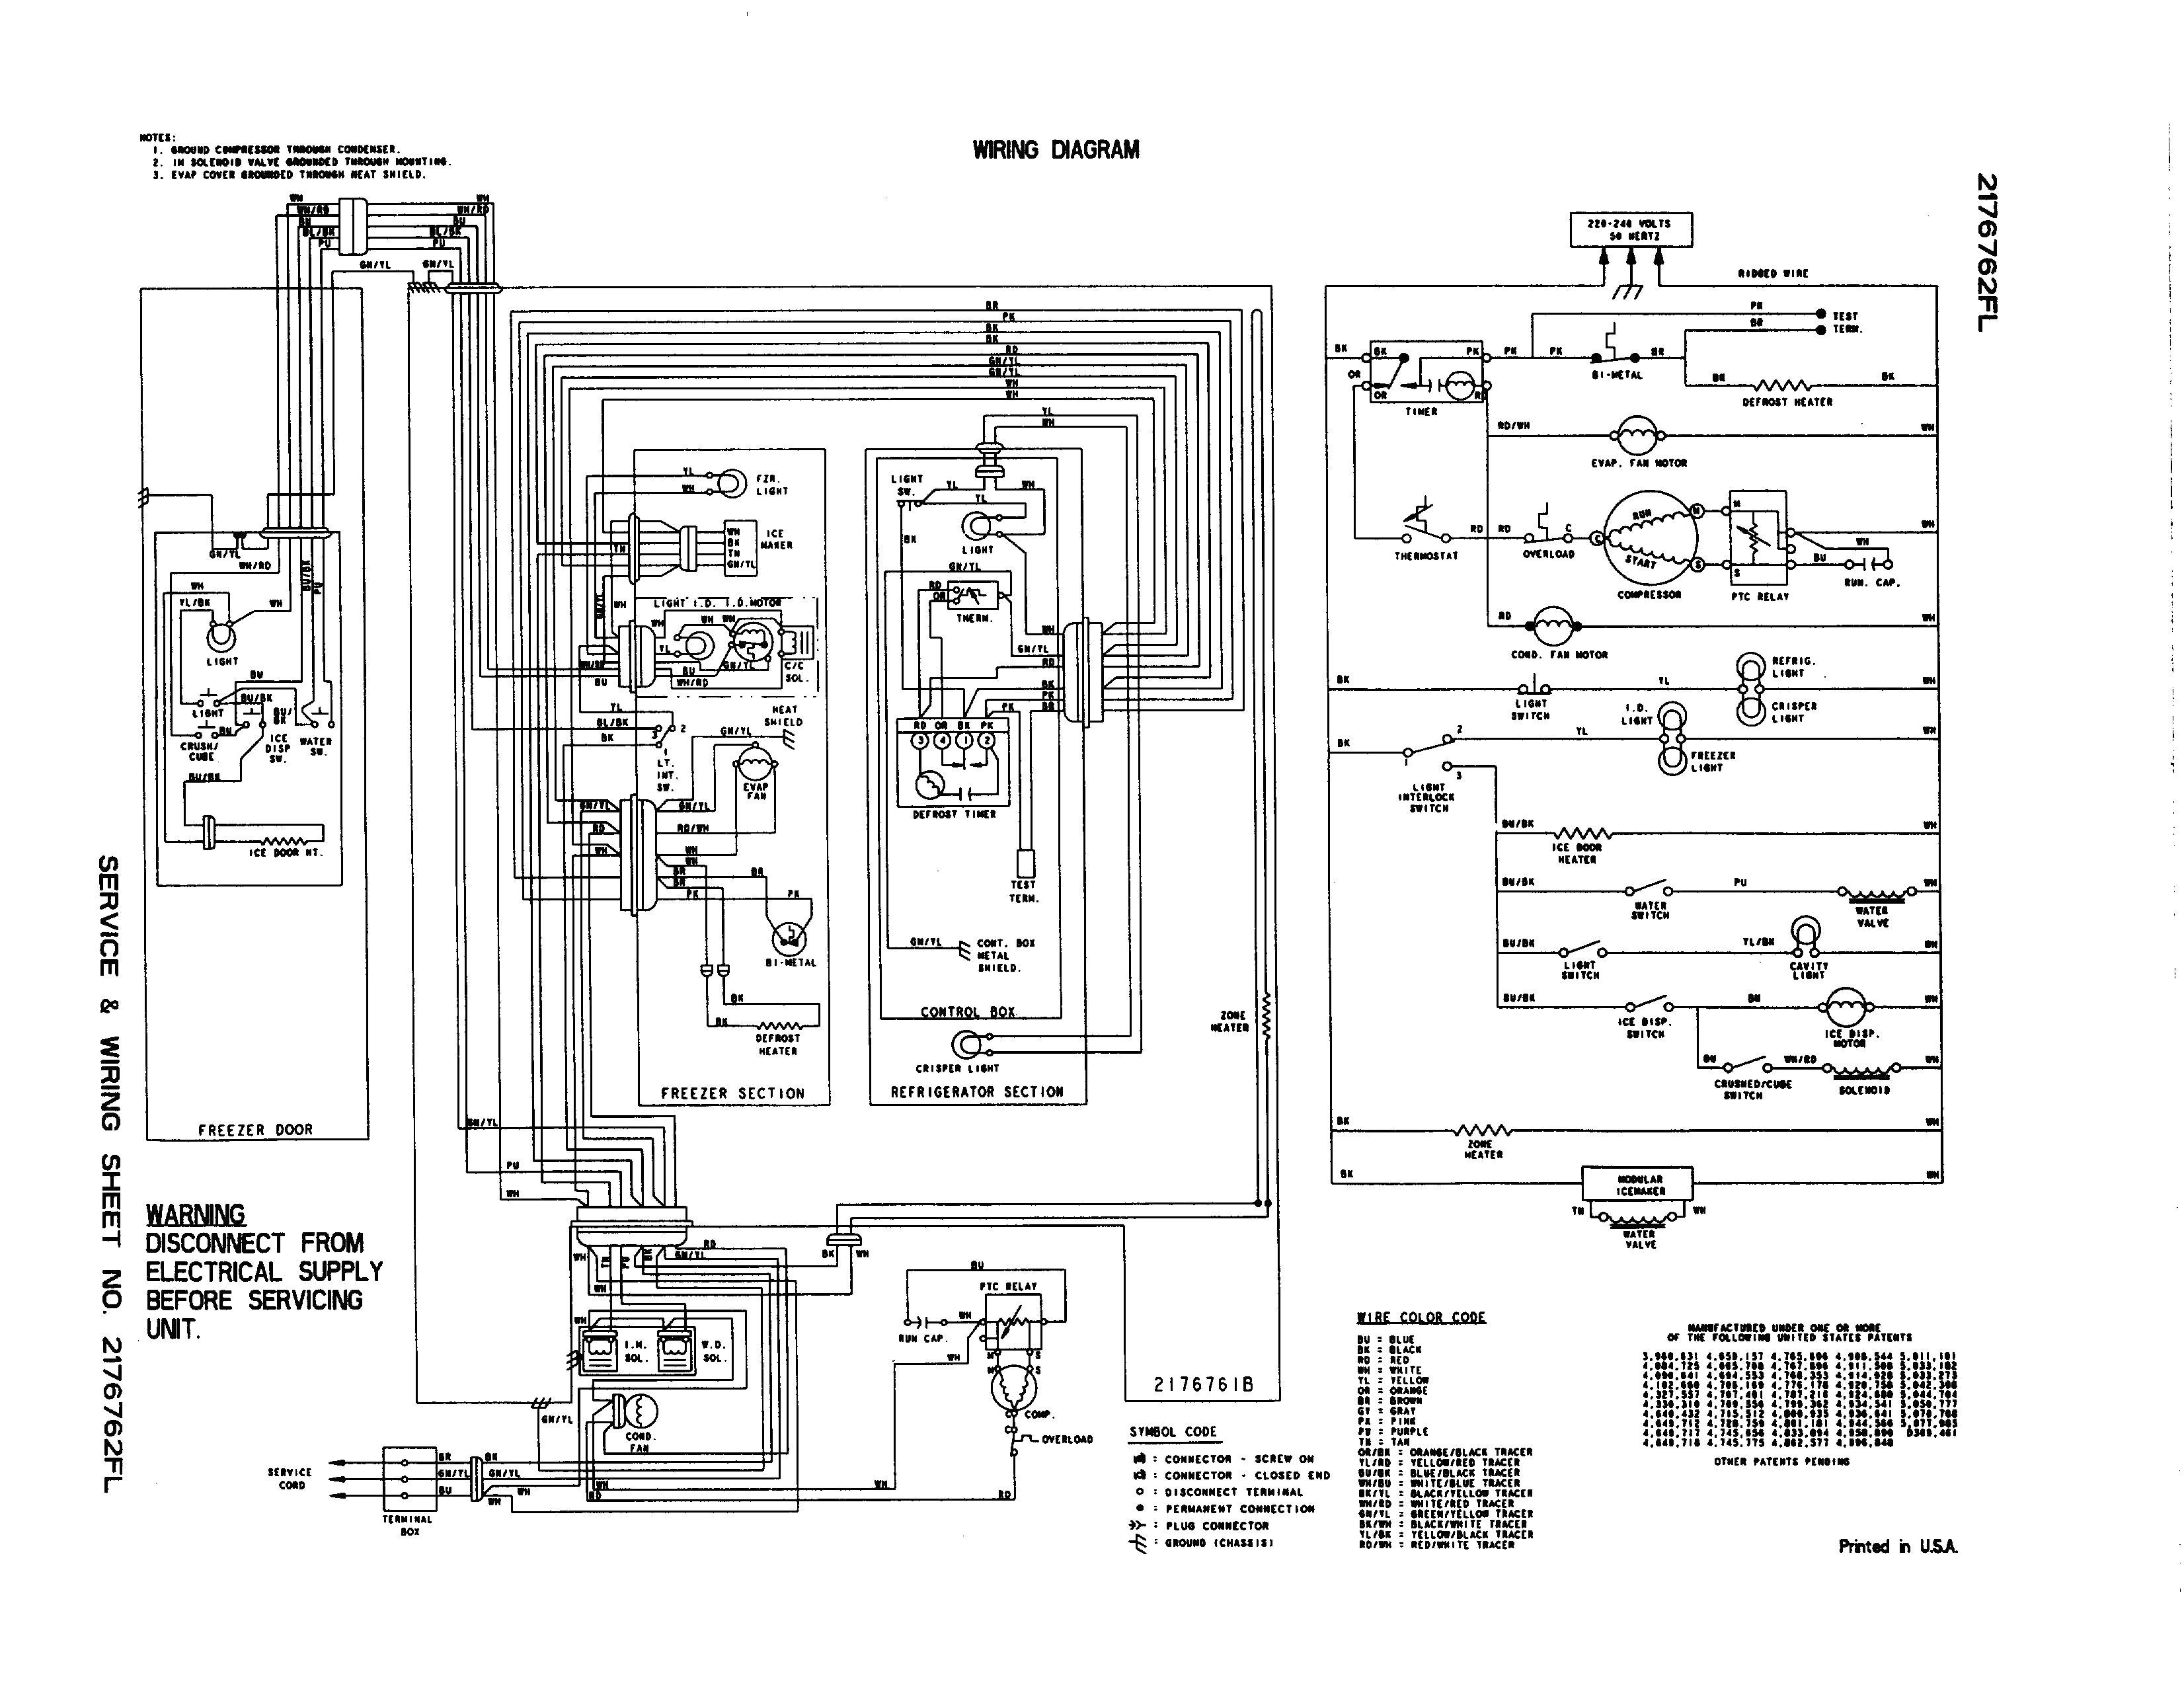 True Refrigeration Wiring Diagram Beverage Air Diagrams Fine T Refrigerator Symbols Drawing Full